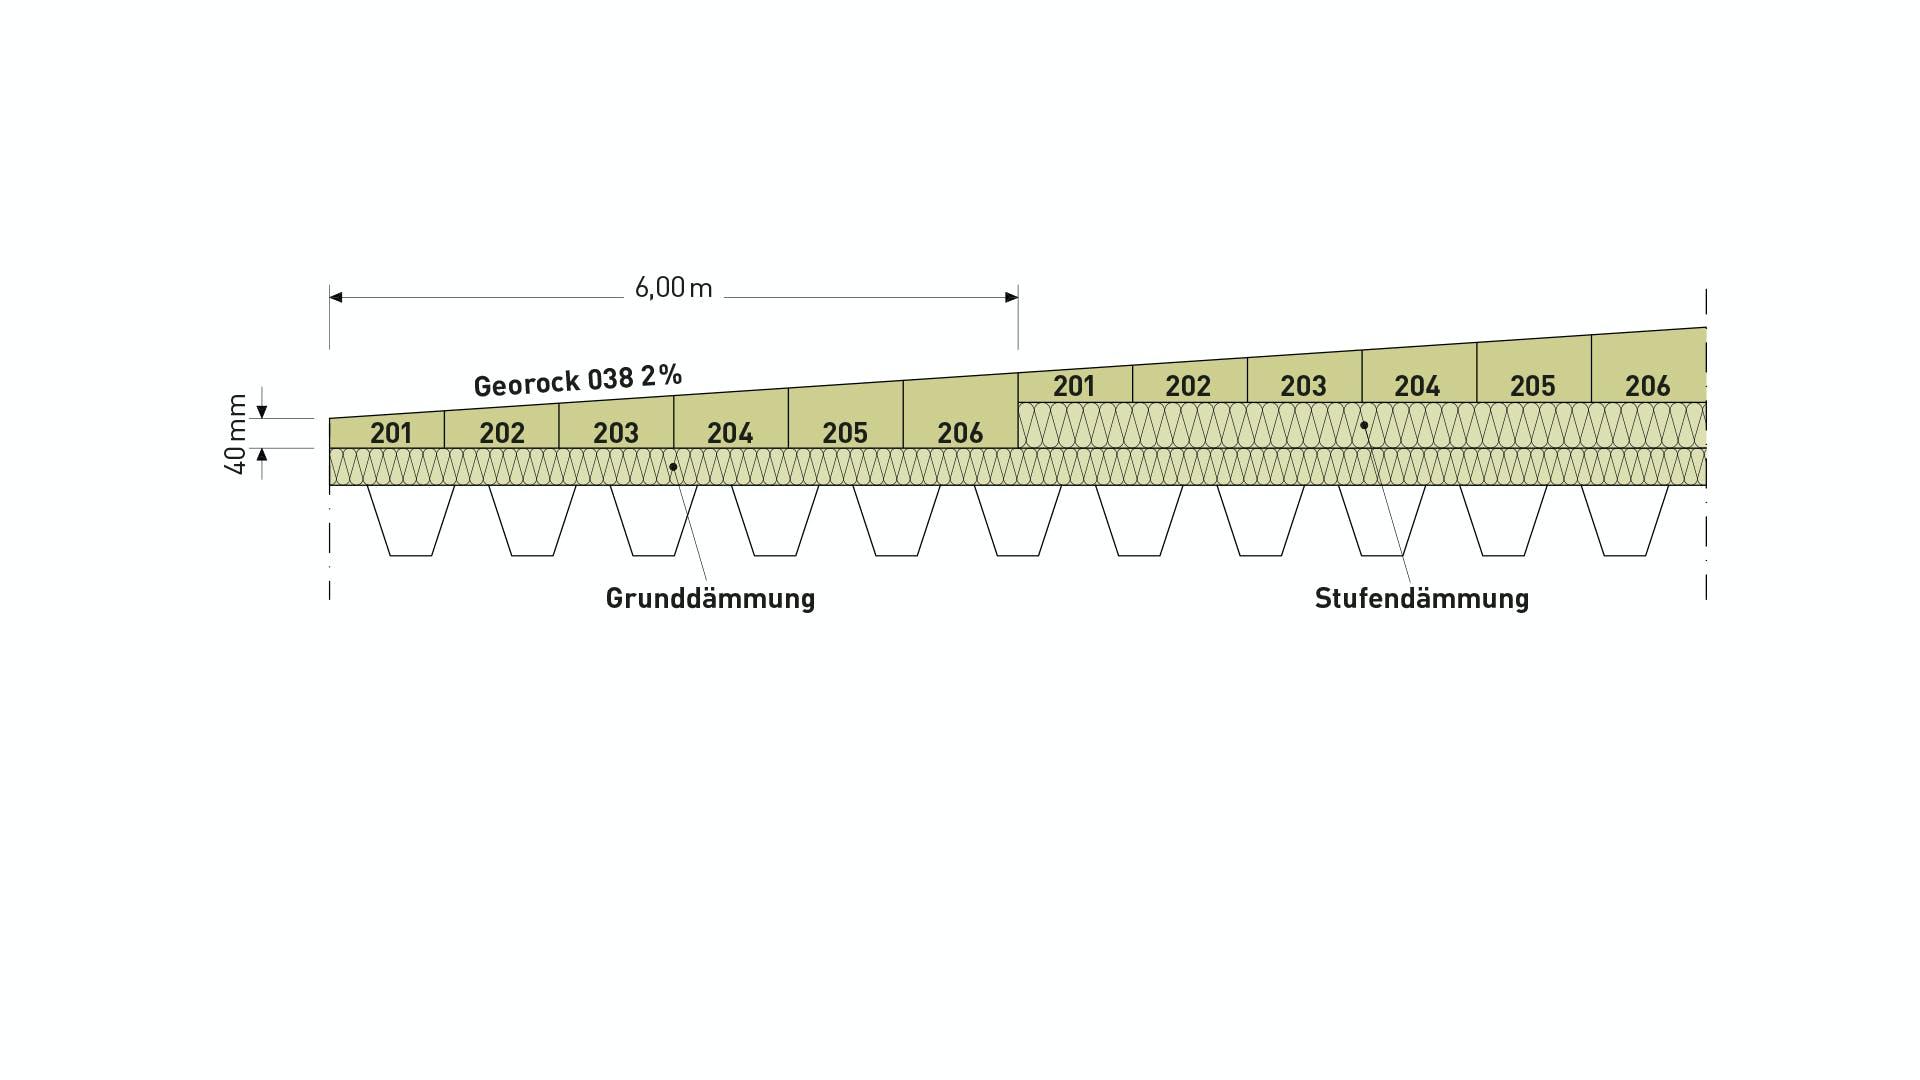 product, flat roof, flatroof, georock 038, georock 038 verlegeschema, medium whitespace below, germany